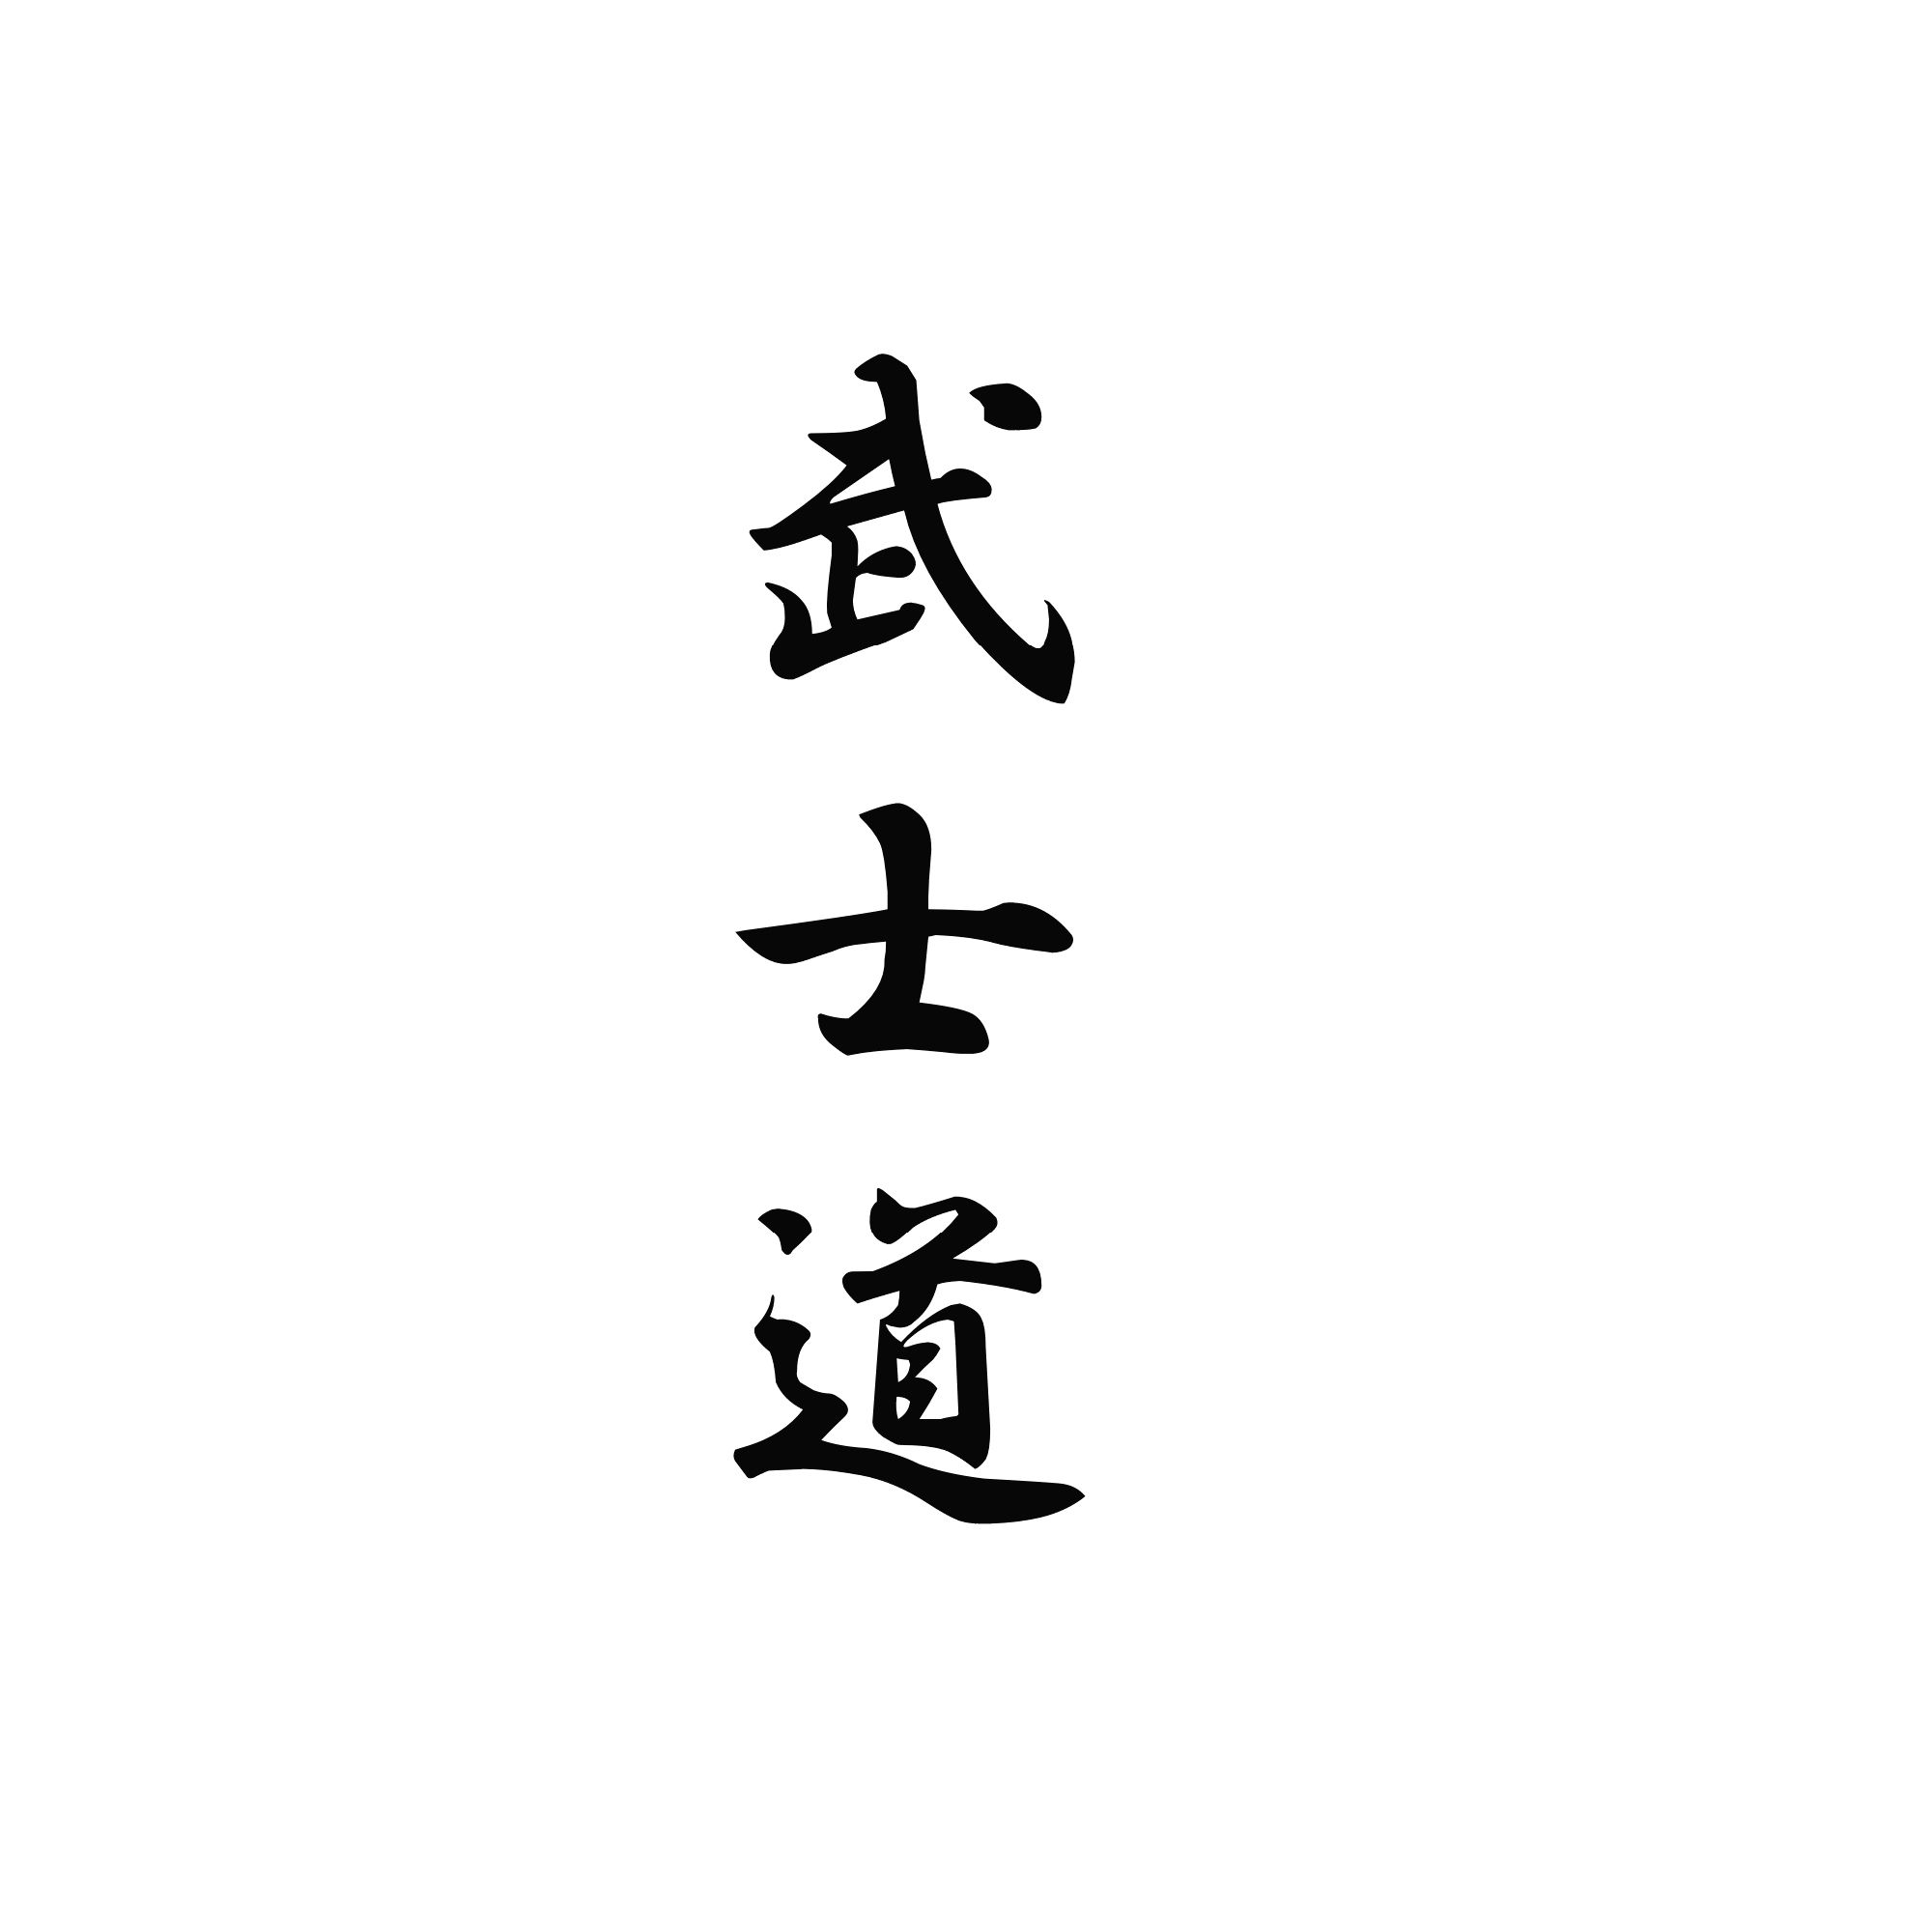 Bushido Way Of The Warrior Kanji Tattoo Samurai Tattoo